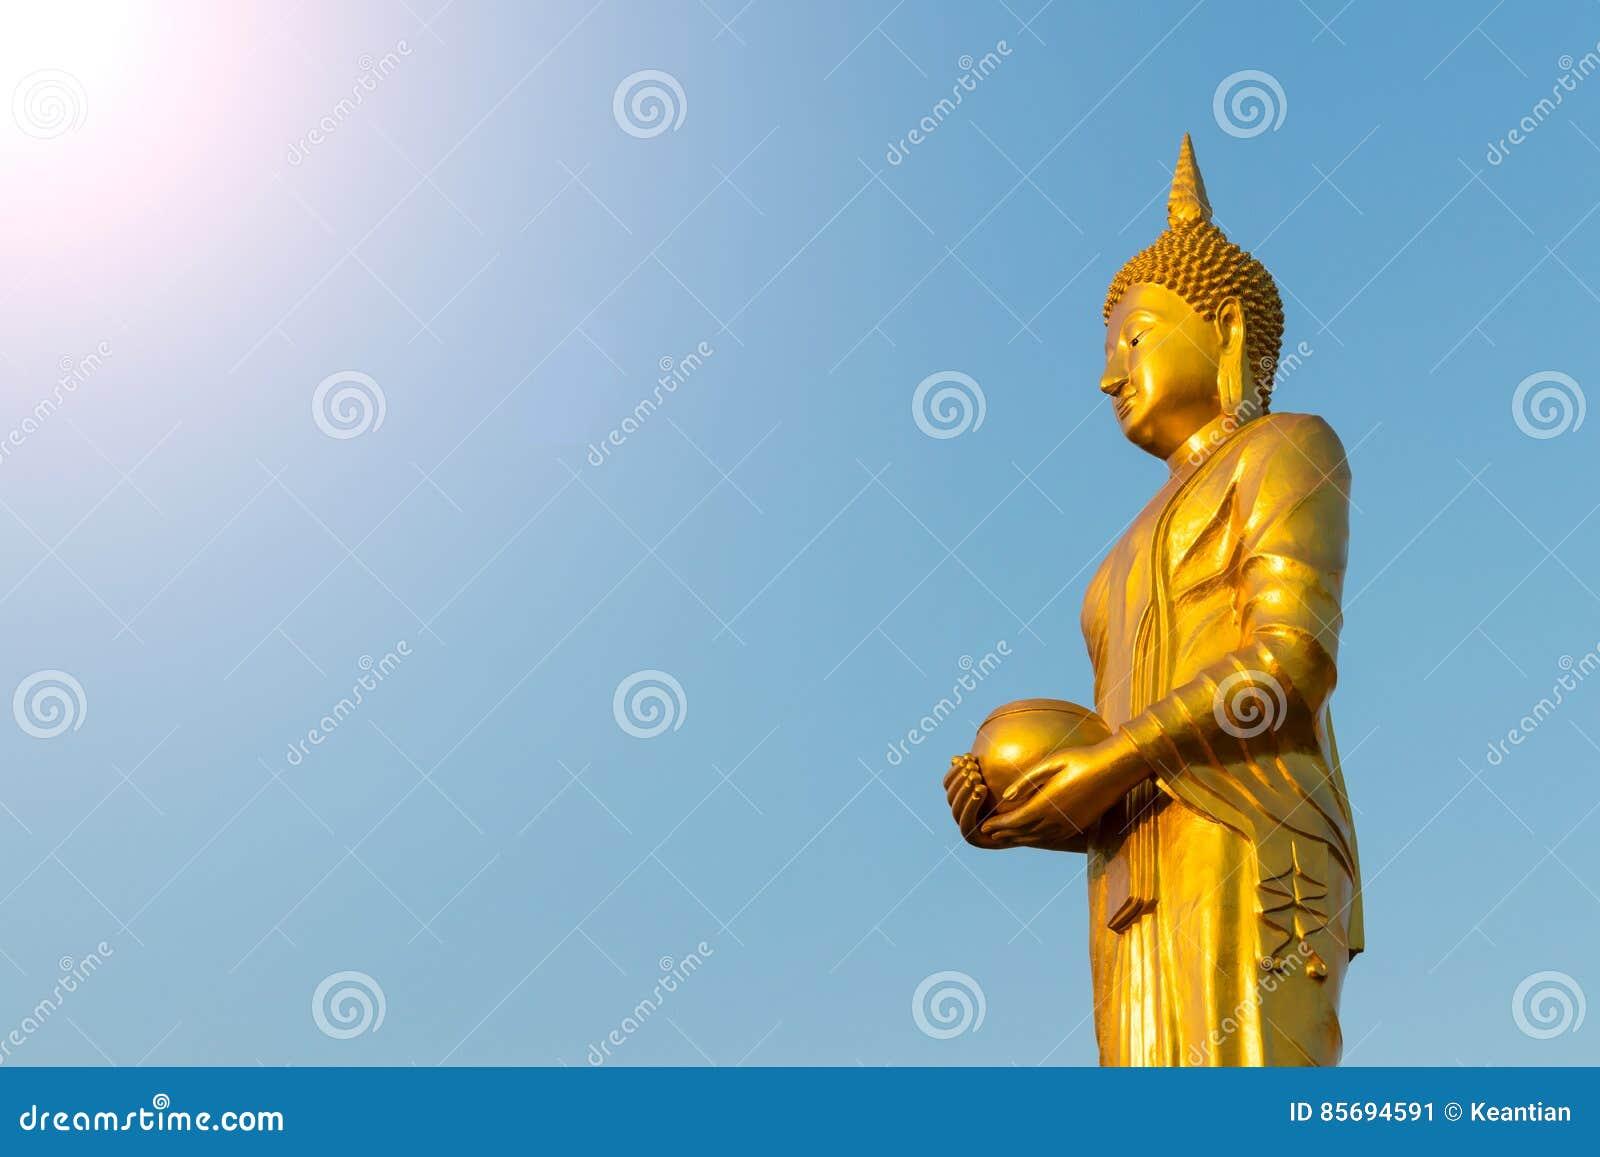 Aumône de Bouddha au ciel